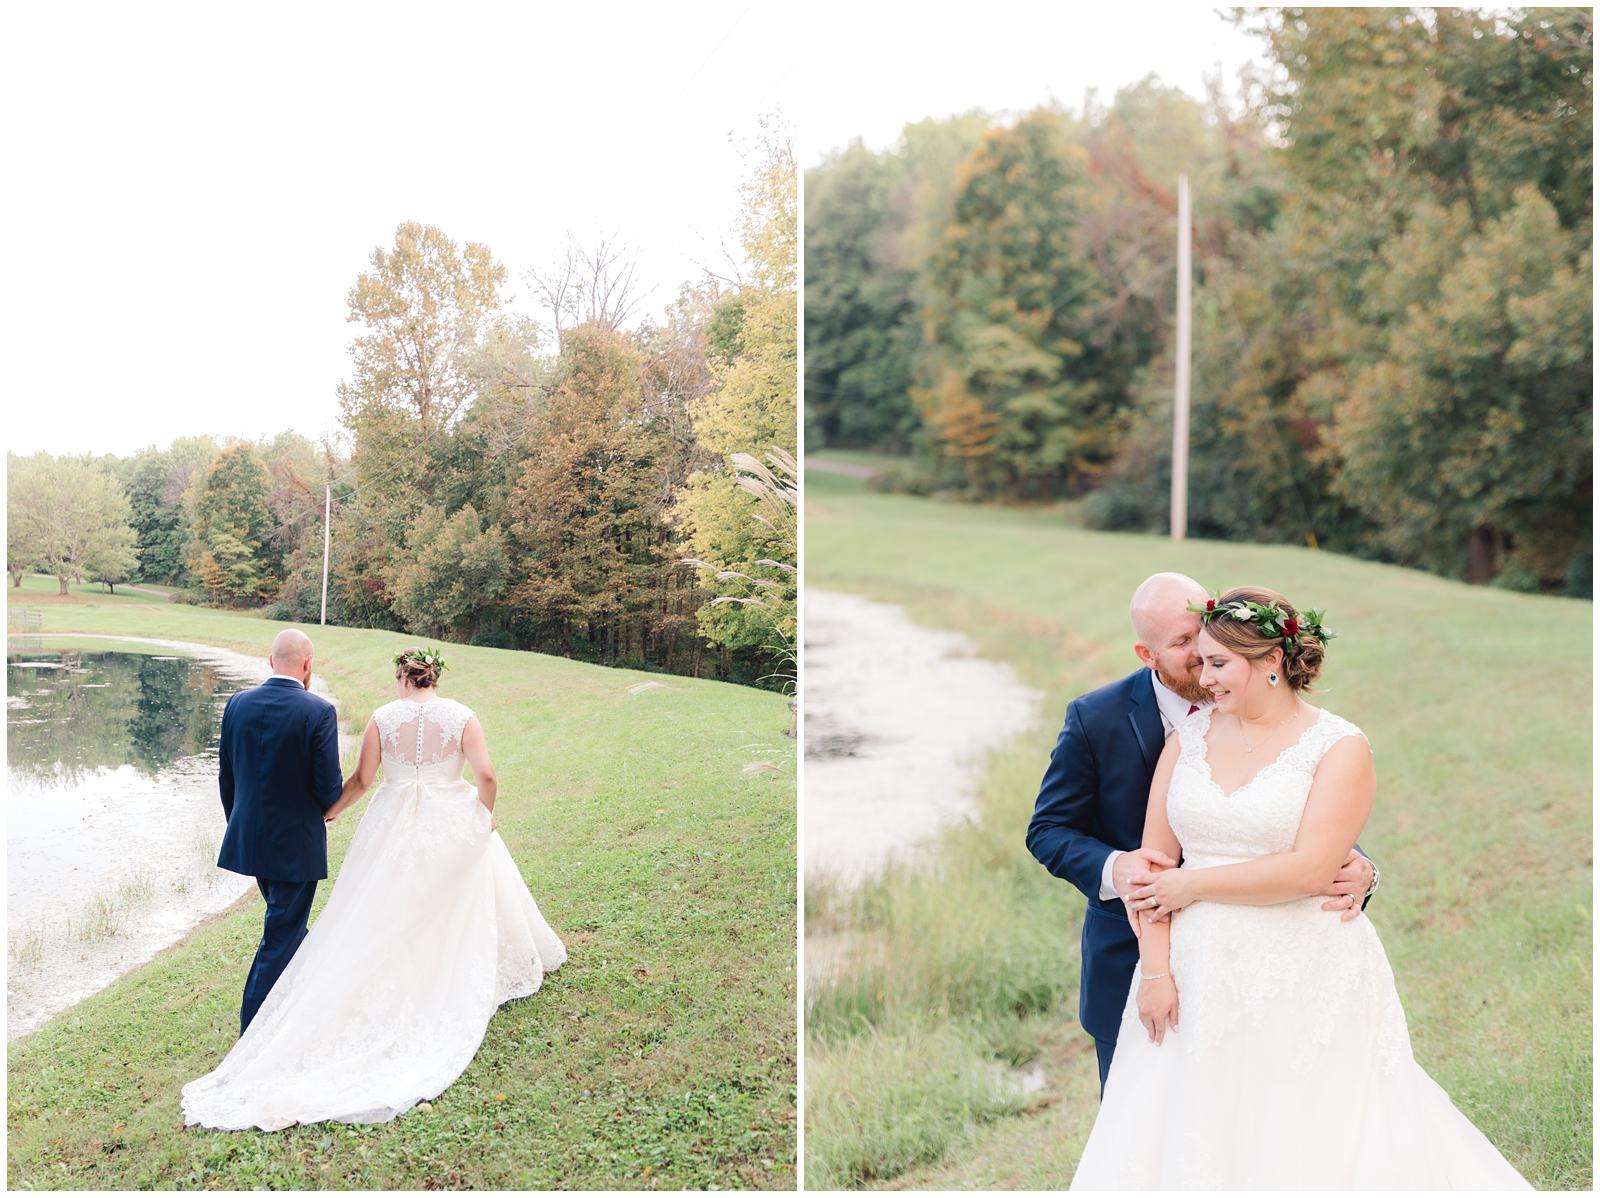 lancaster-ohio-fall-wedding-lra-photo_0012.jpg